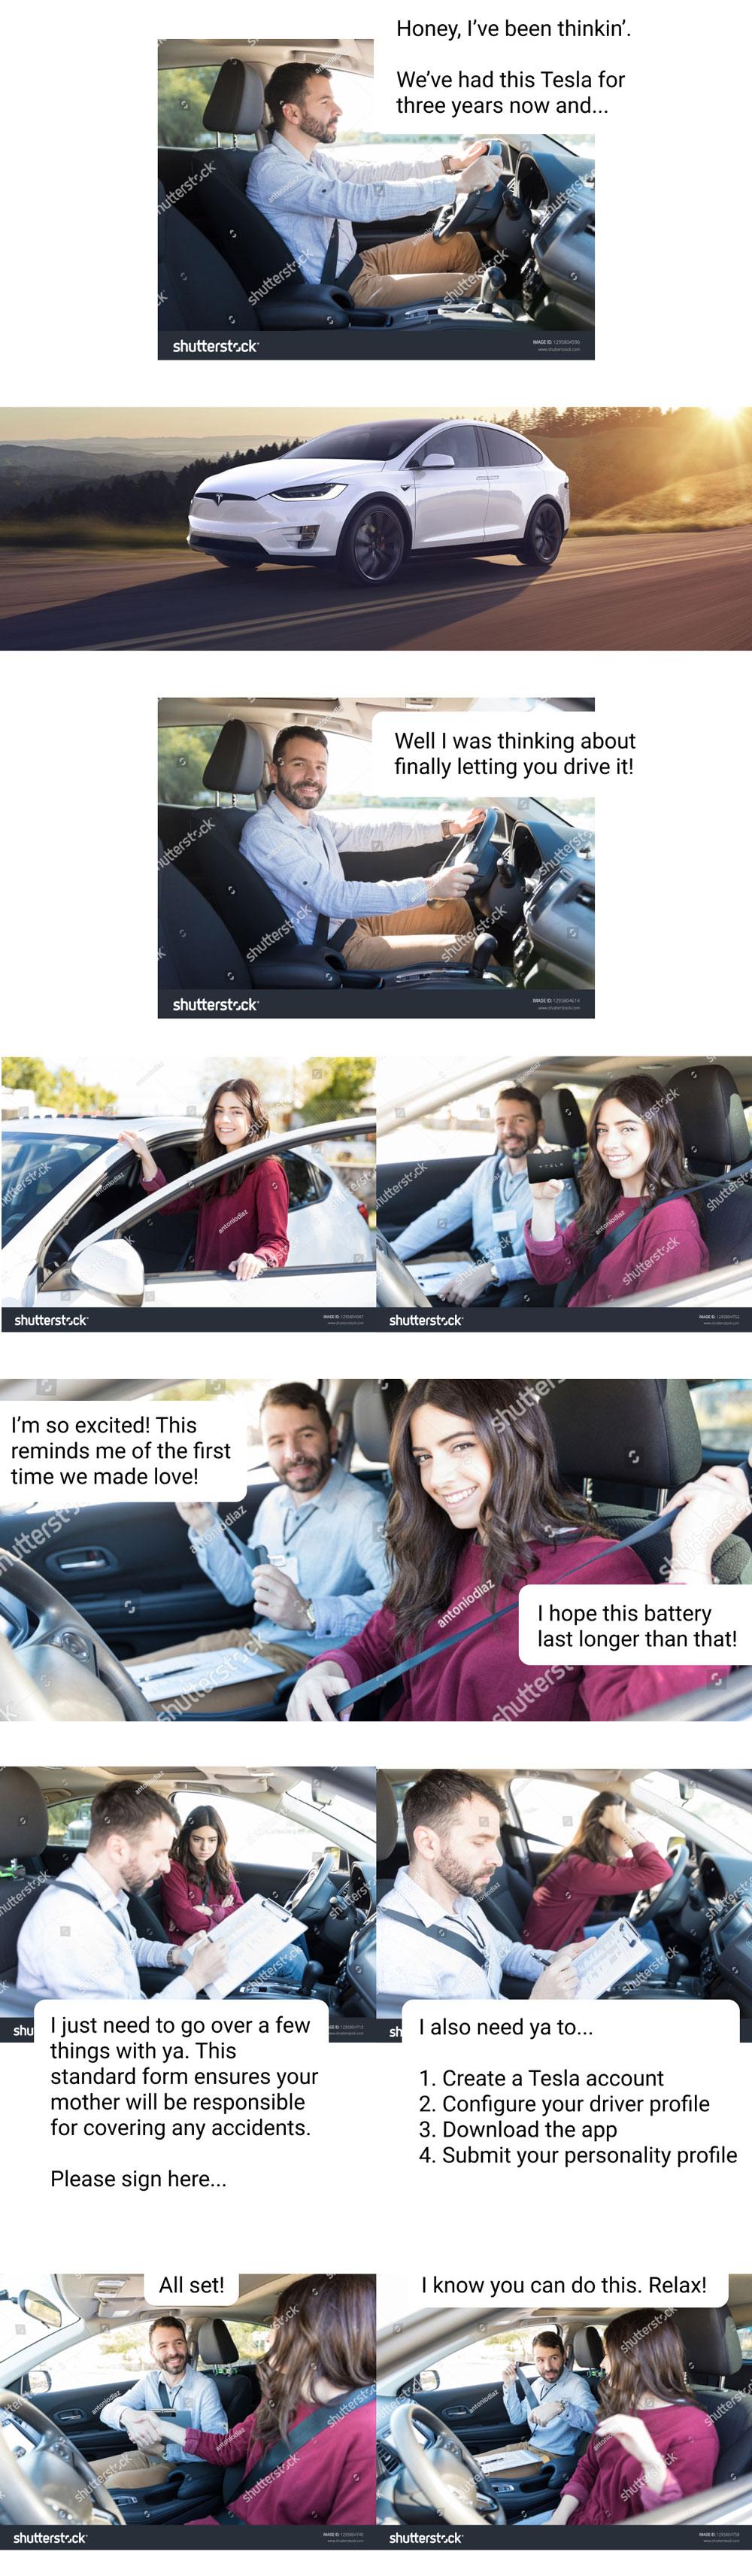 A Tesla love story part 1